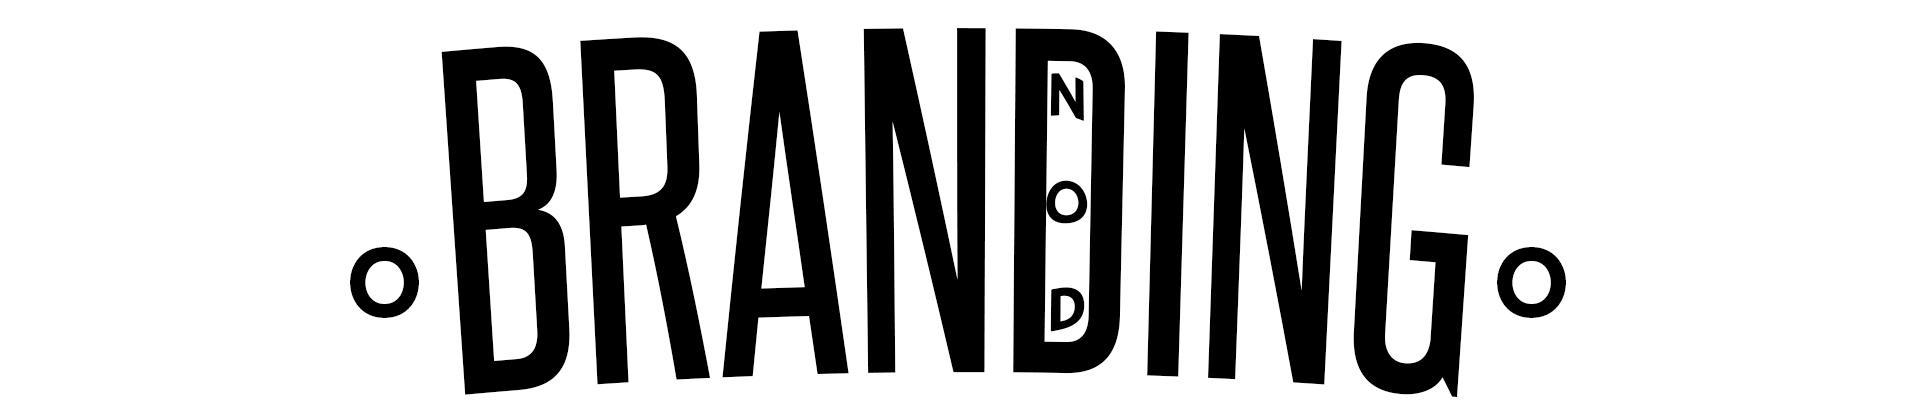 nod branding